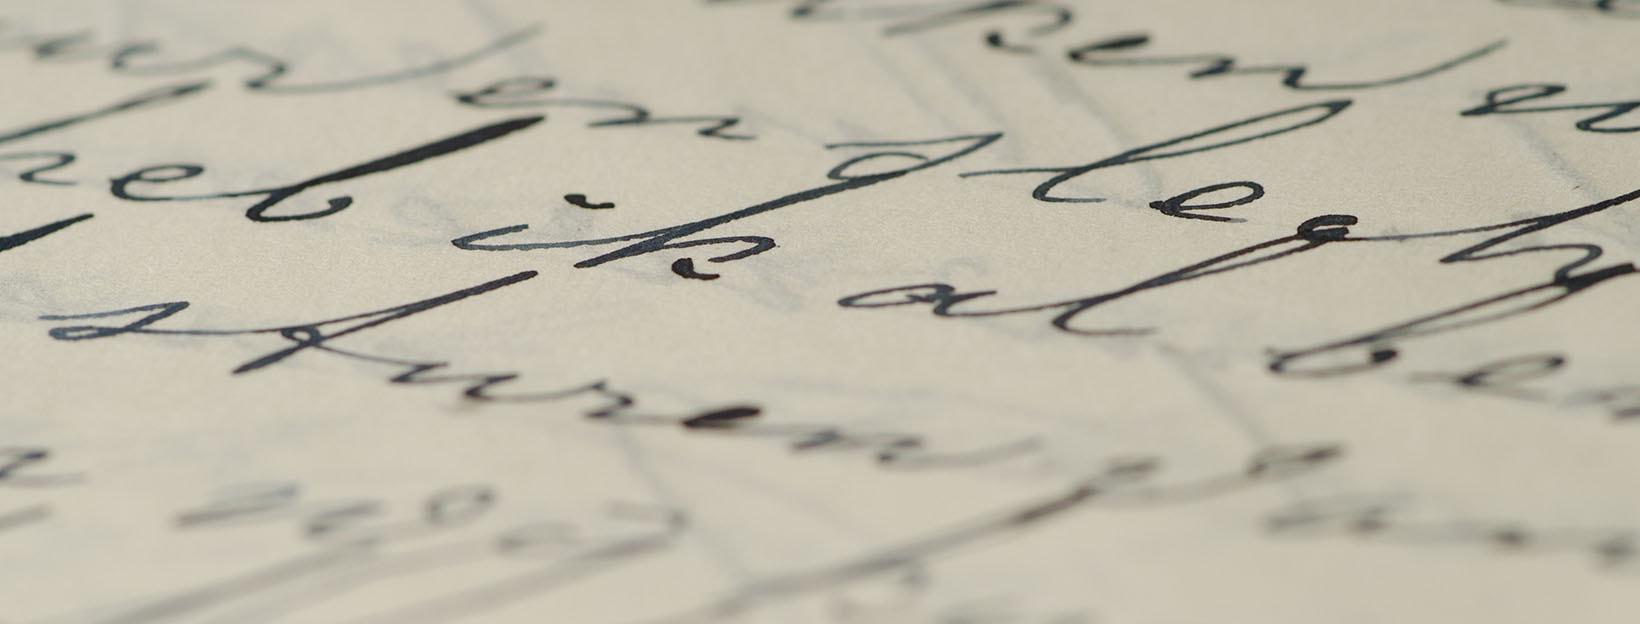 Kostenlose schöne Schriftarten als Blickfang